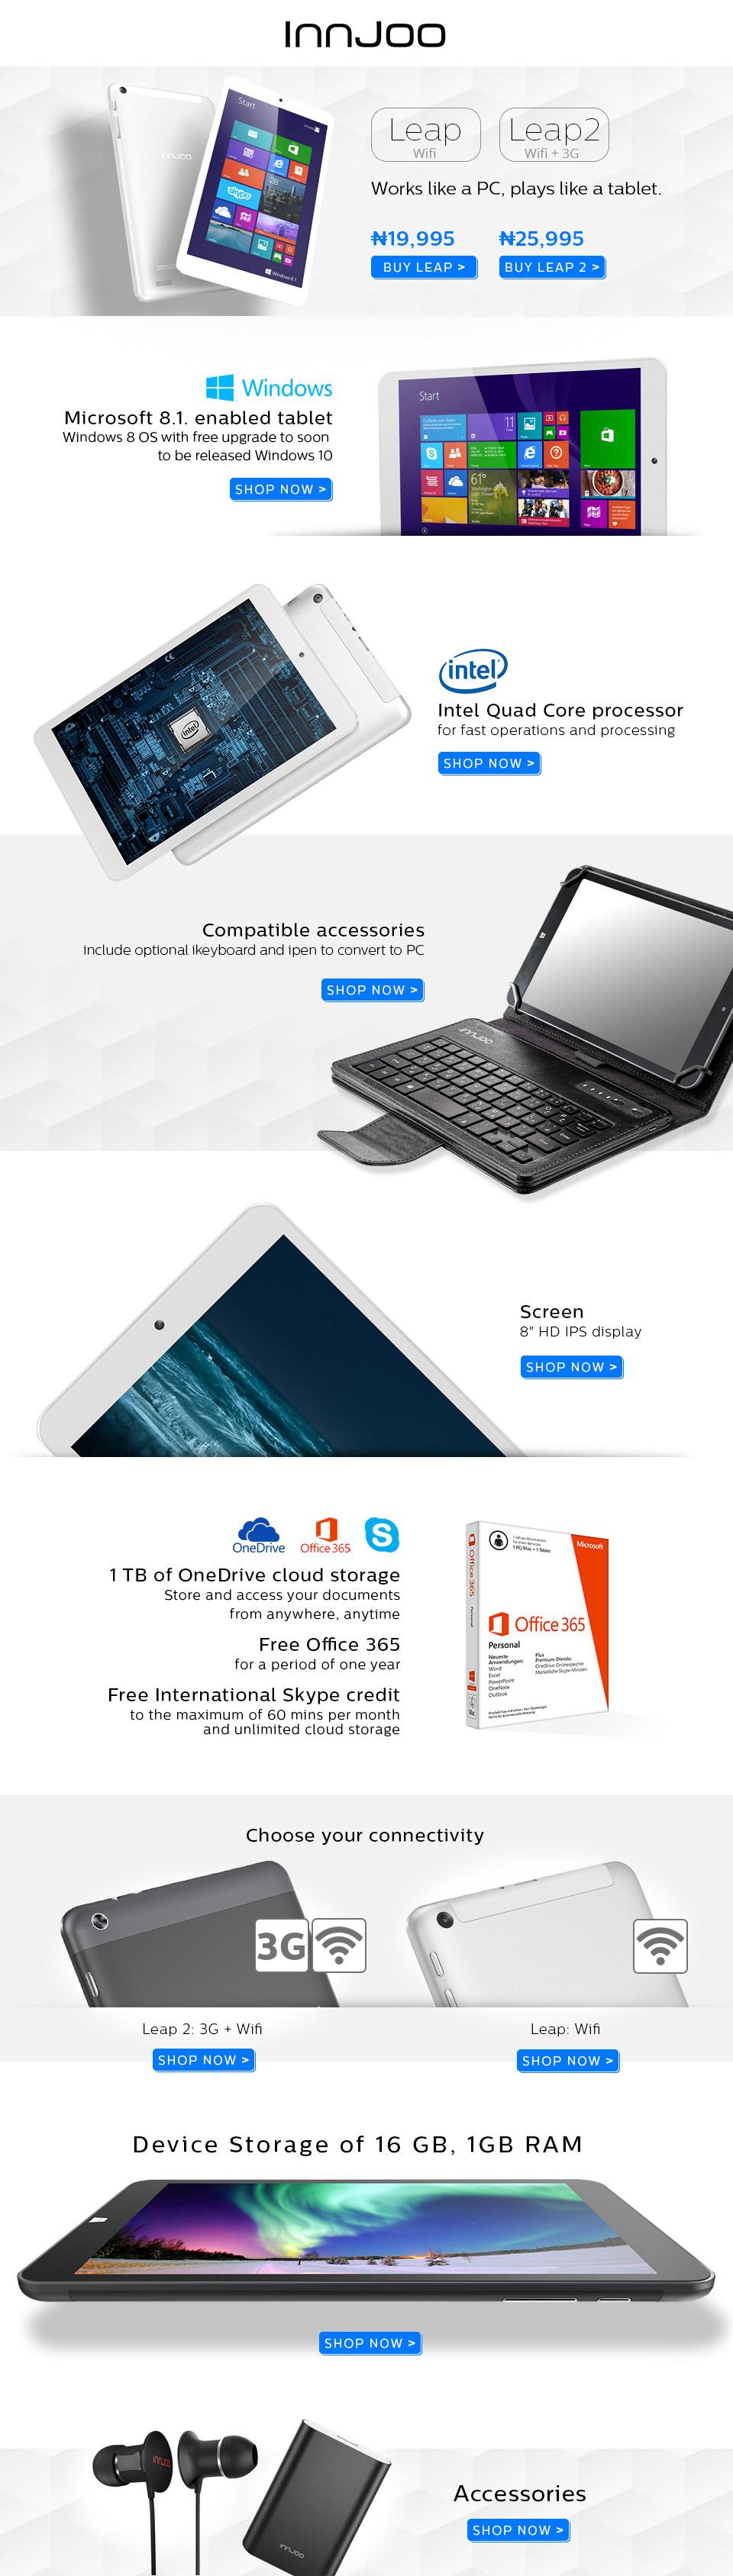 shopinshop-innjoo-tablet